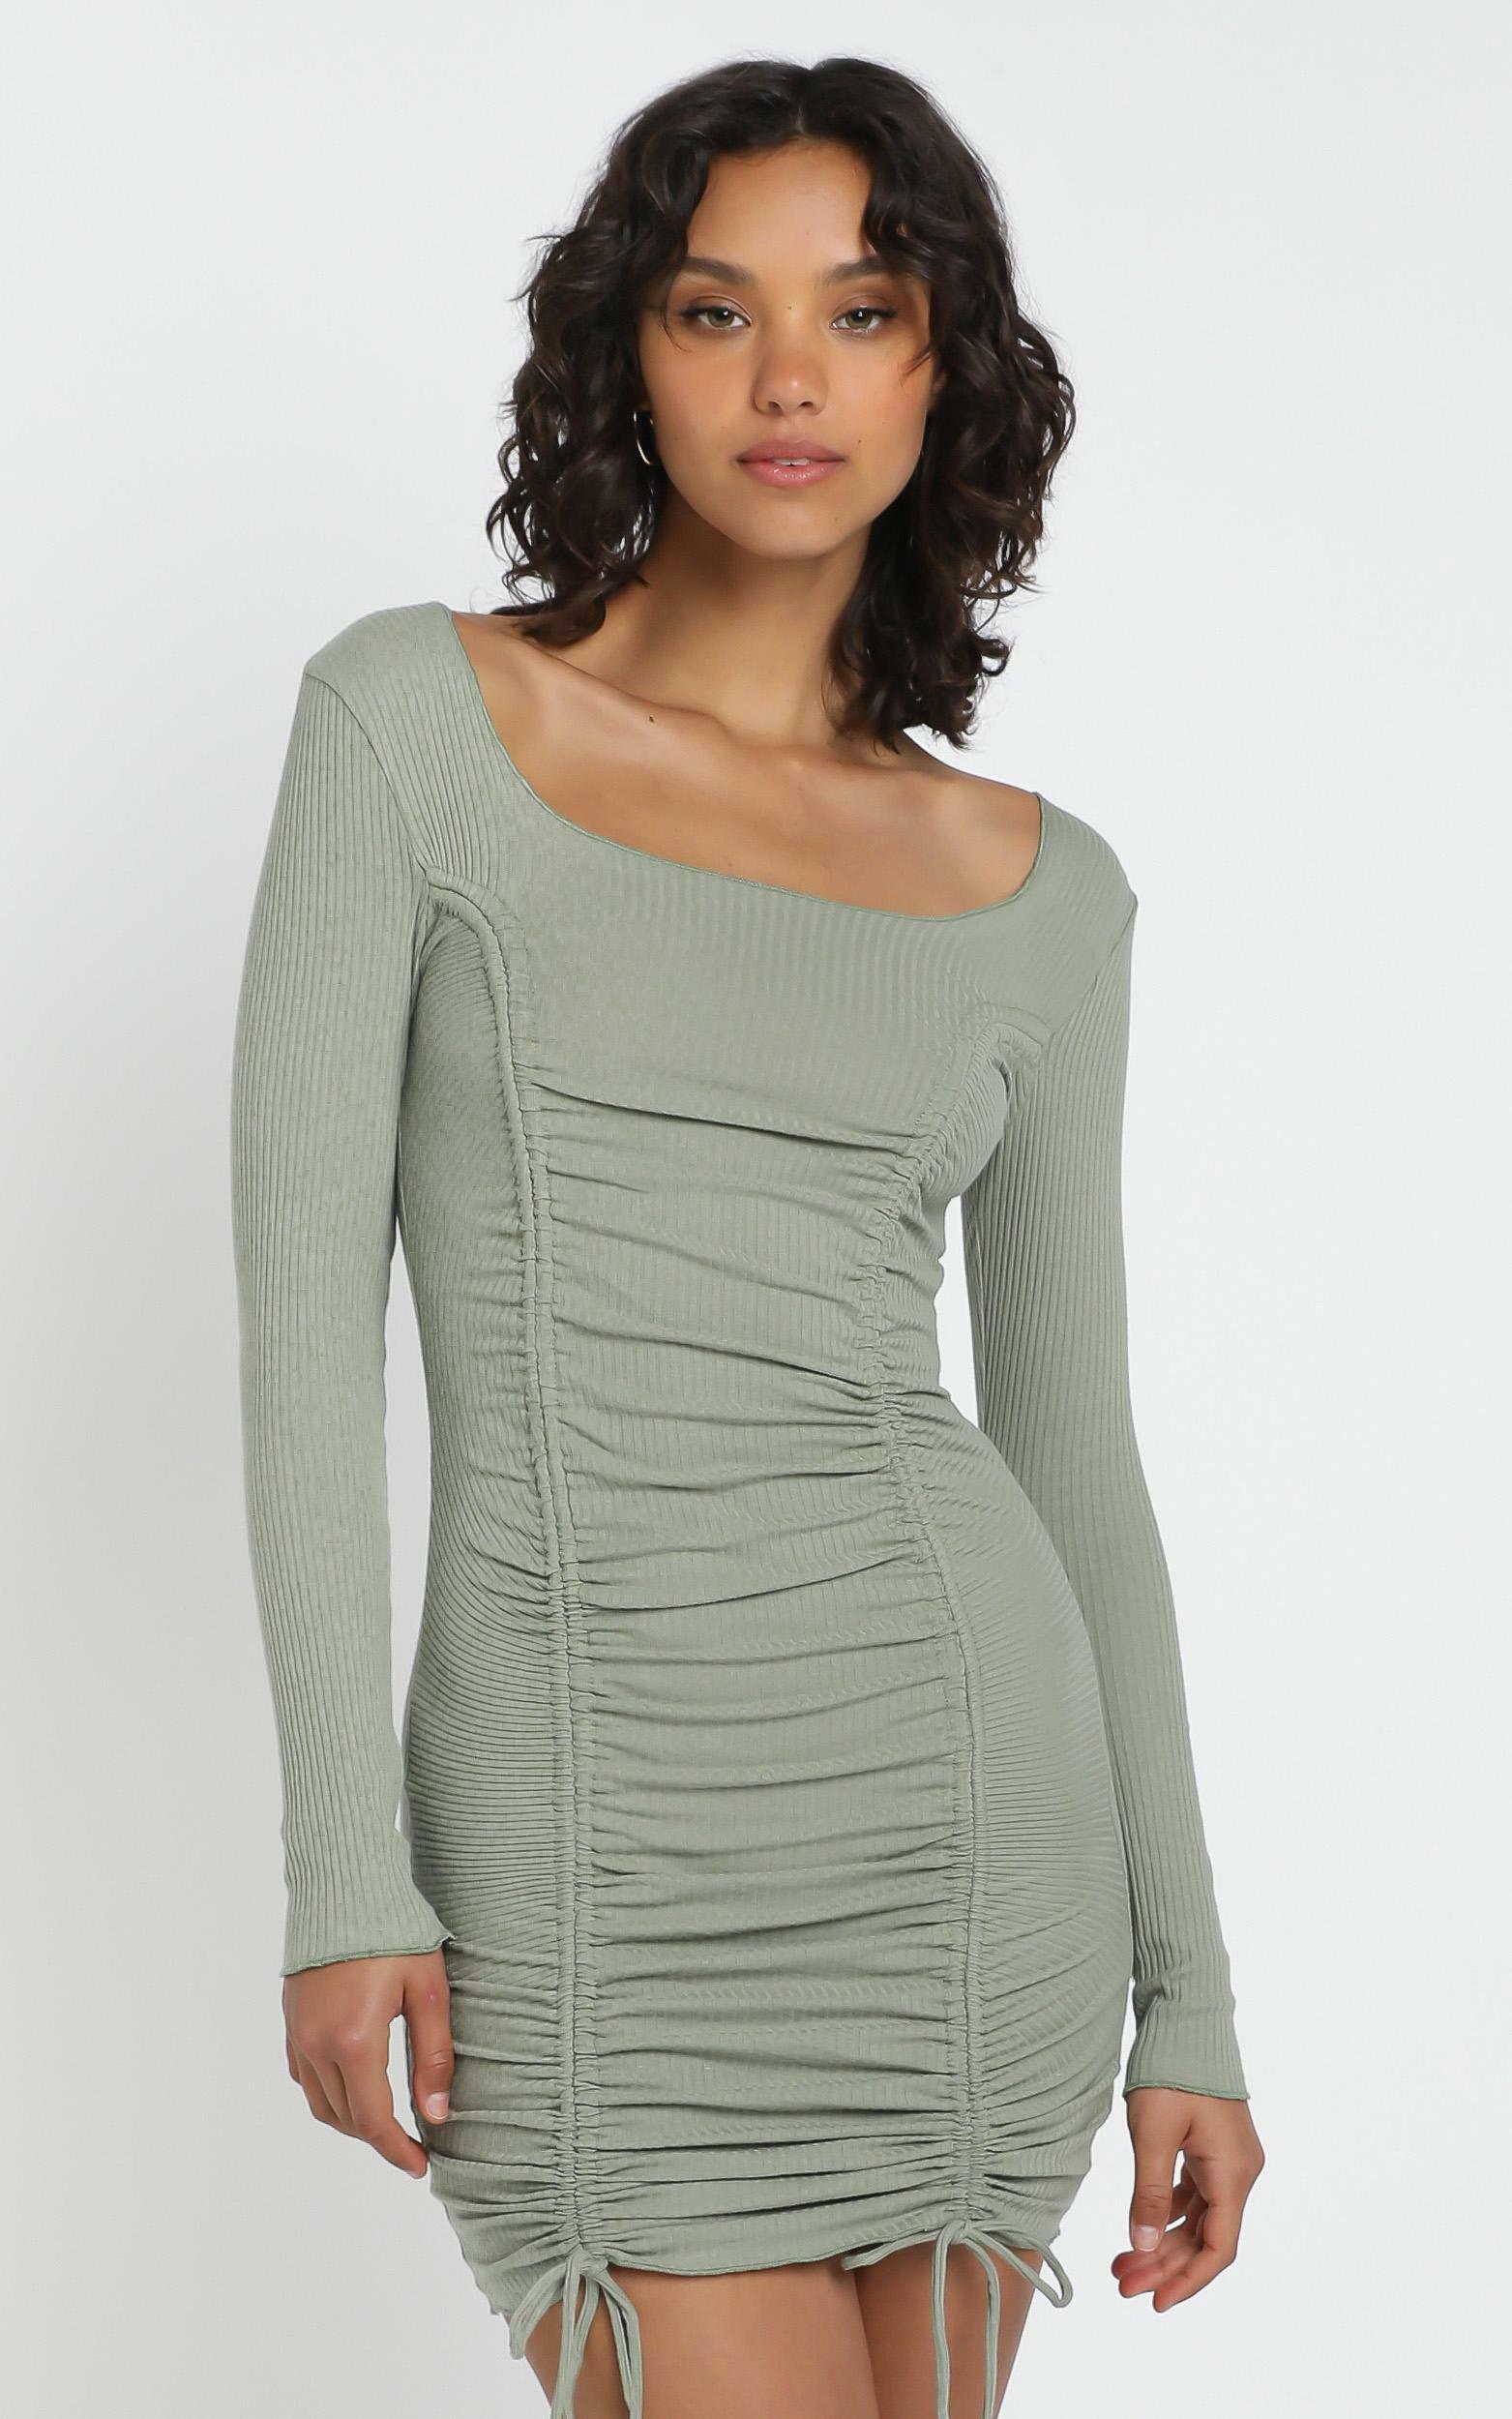 Nina Dress in Khaki - 6 (XS), Khaki, hi-res image number null